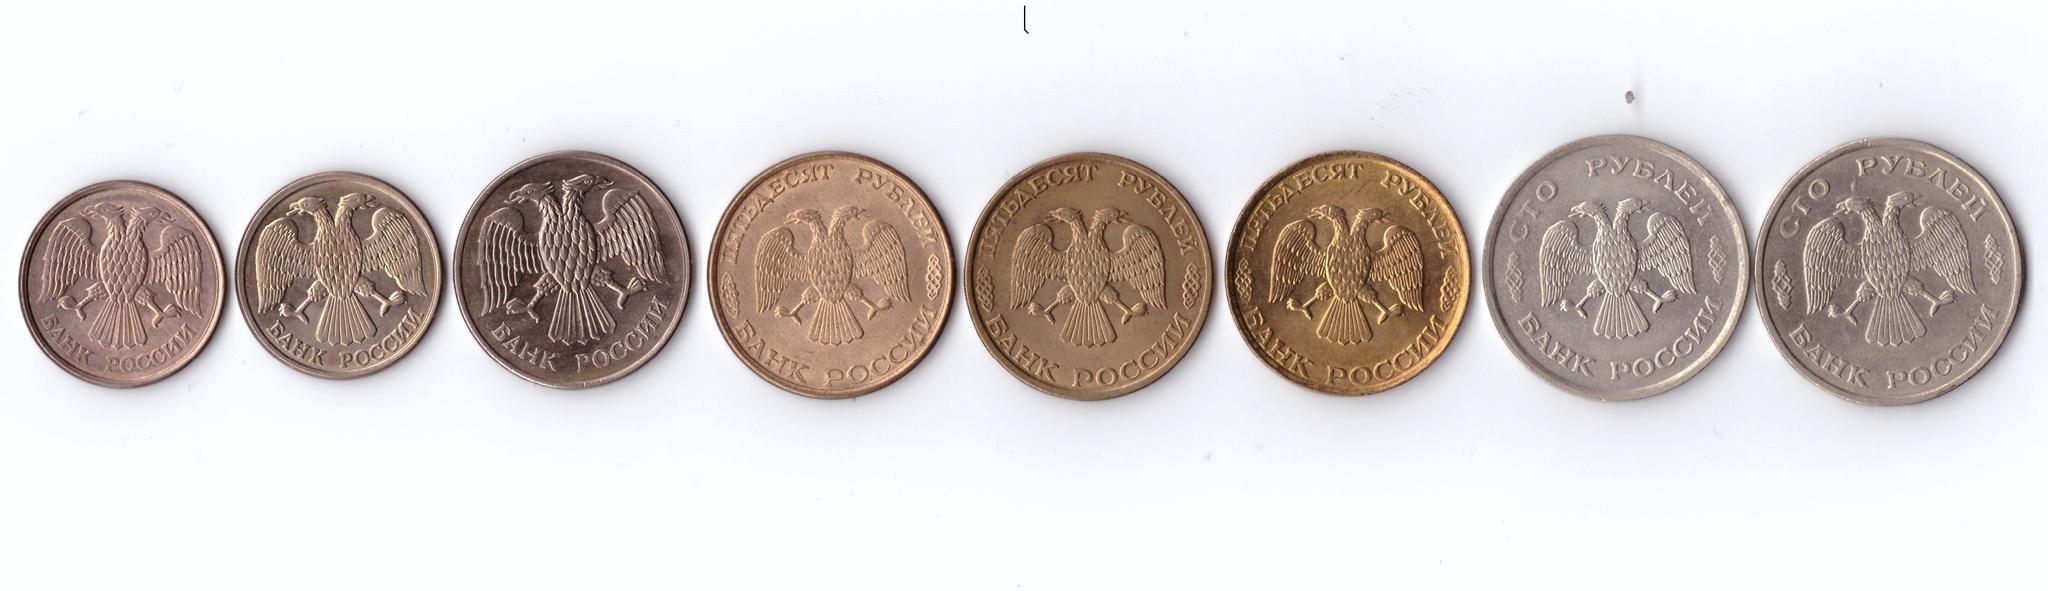 Годовой набор 1993 год 10, 20, 50, 100 рублей ММД и ЛМД (8 монет)